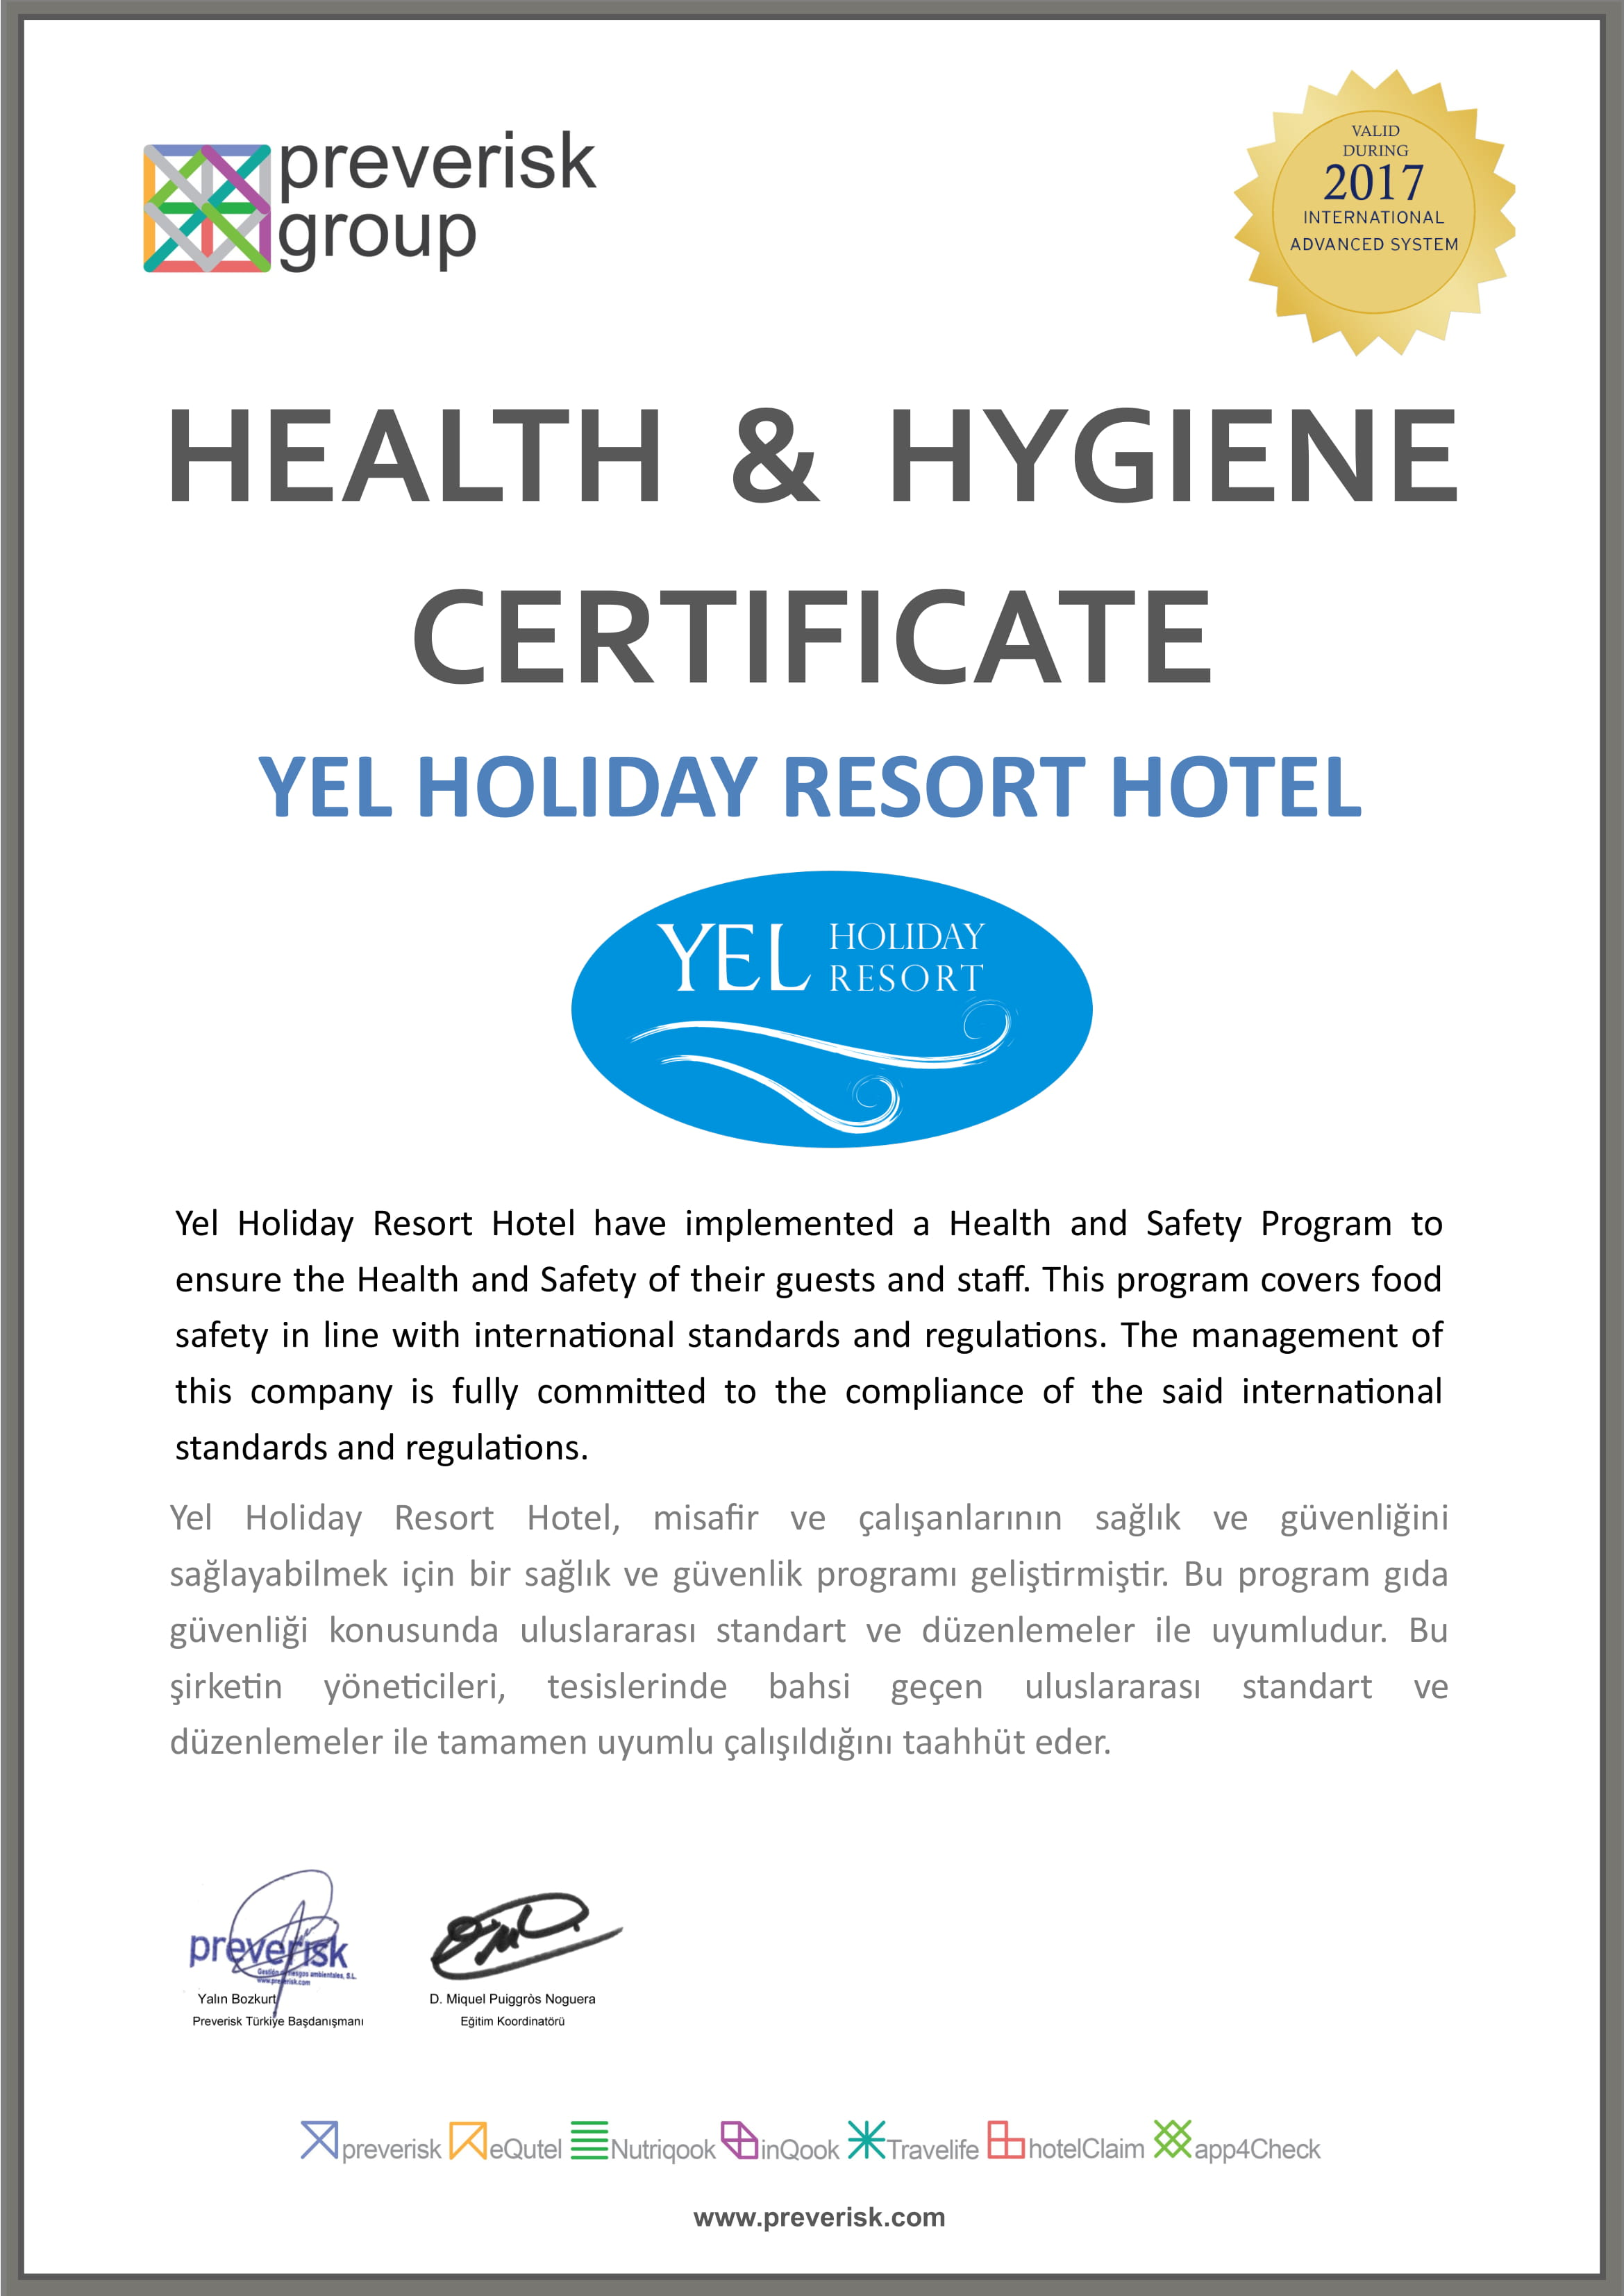 yel_holiday_resort_hotel_2017_sertifika-1.jpg